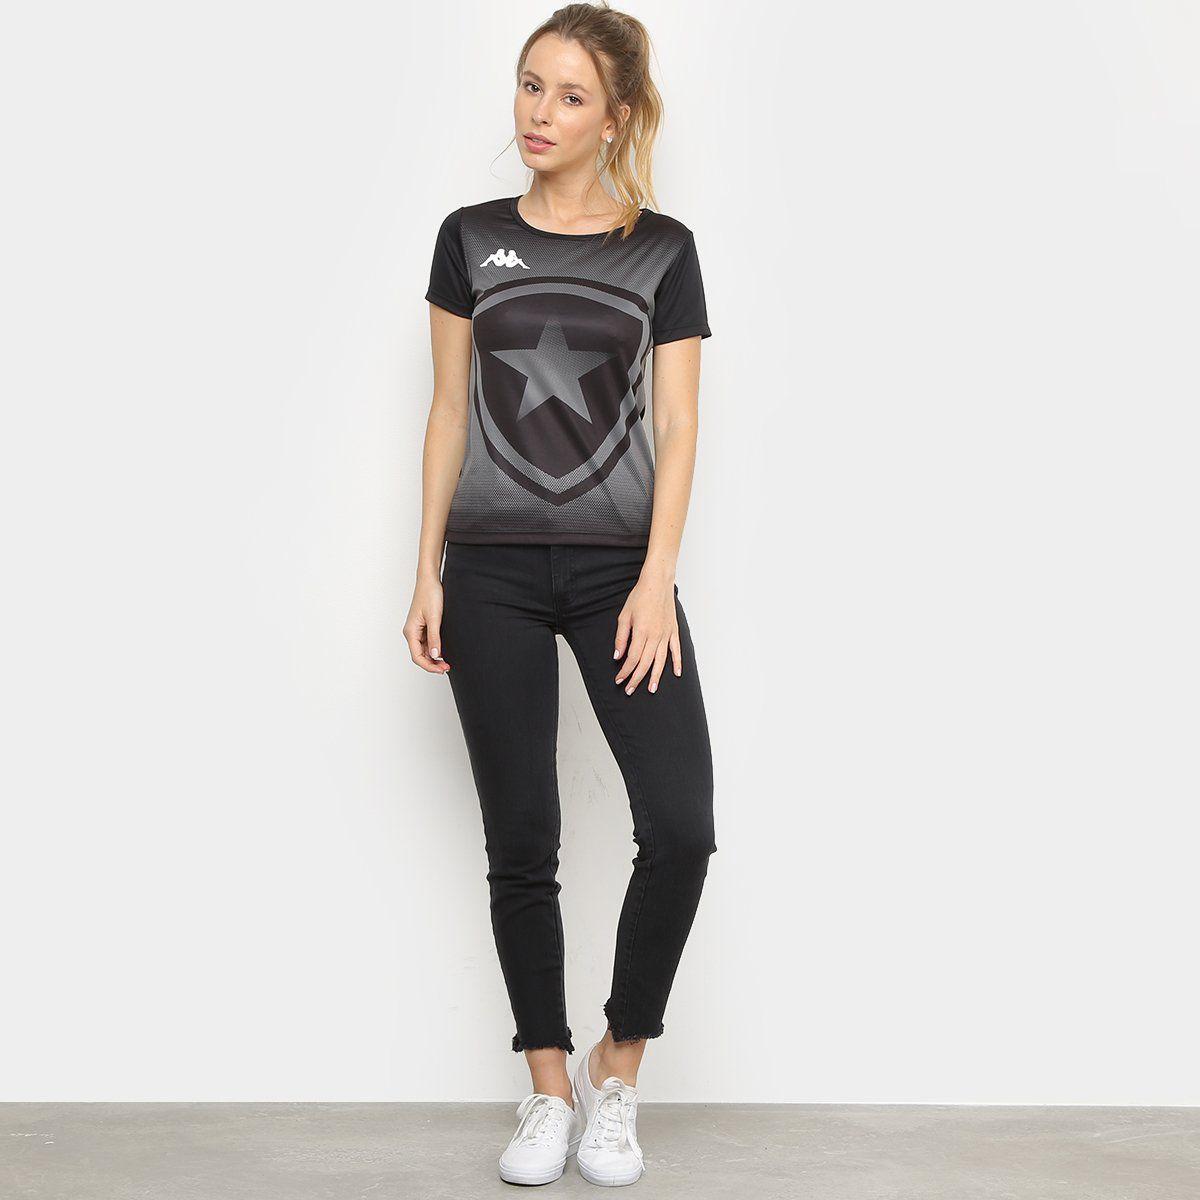 Camiseta Botafogo Escudo Kappa Feminina - Preto